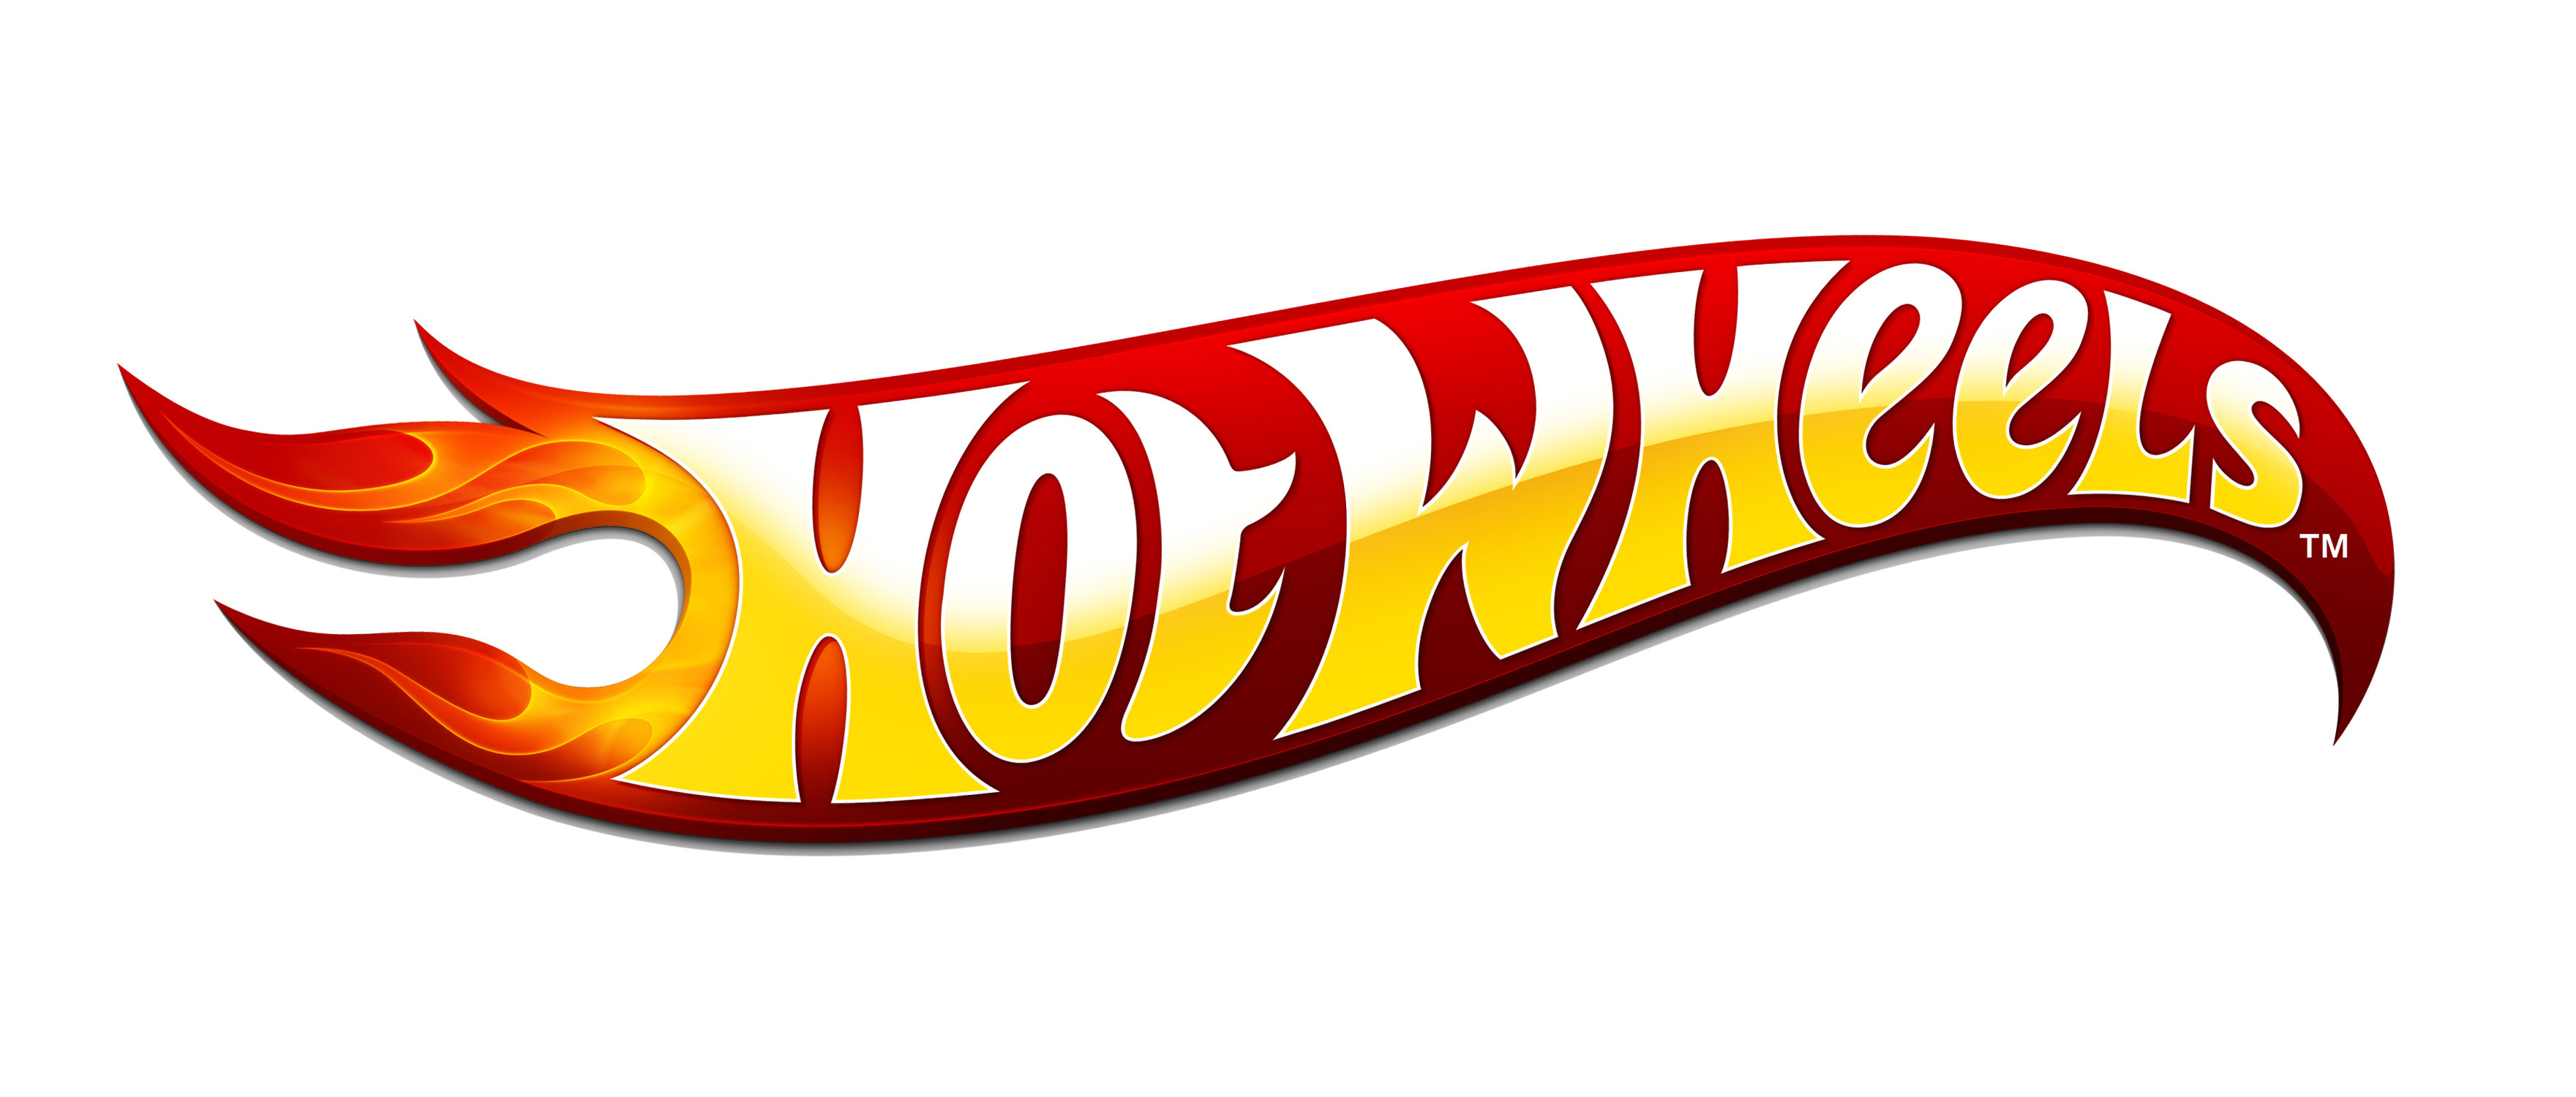 Hot wheels free download. Wheel clipart logo